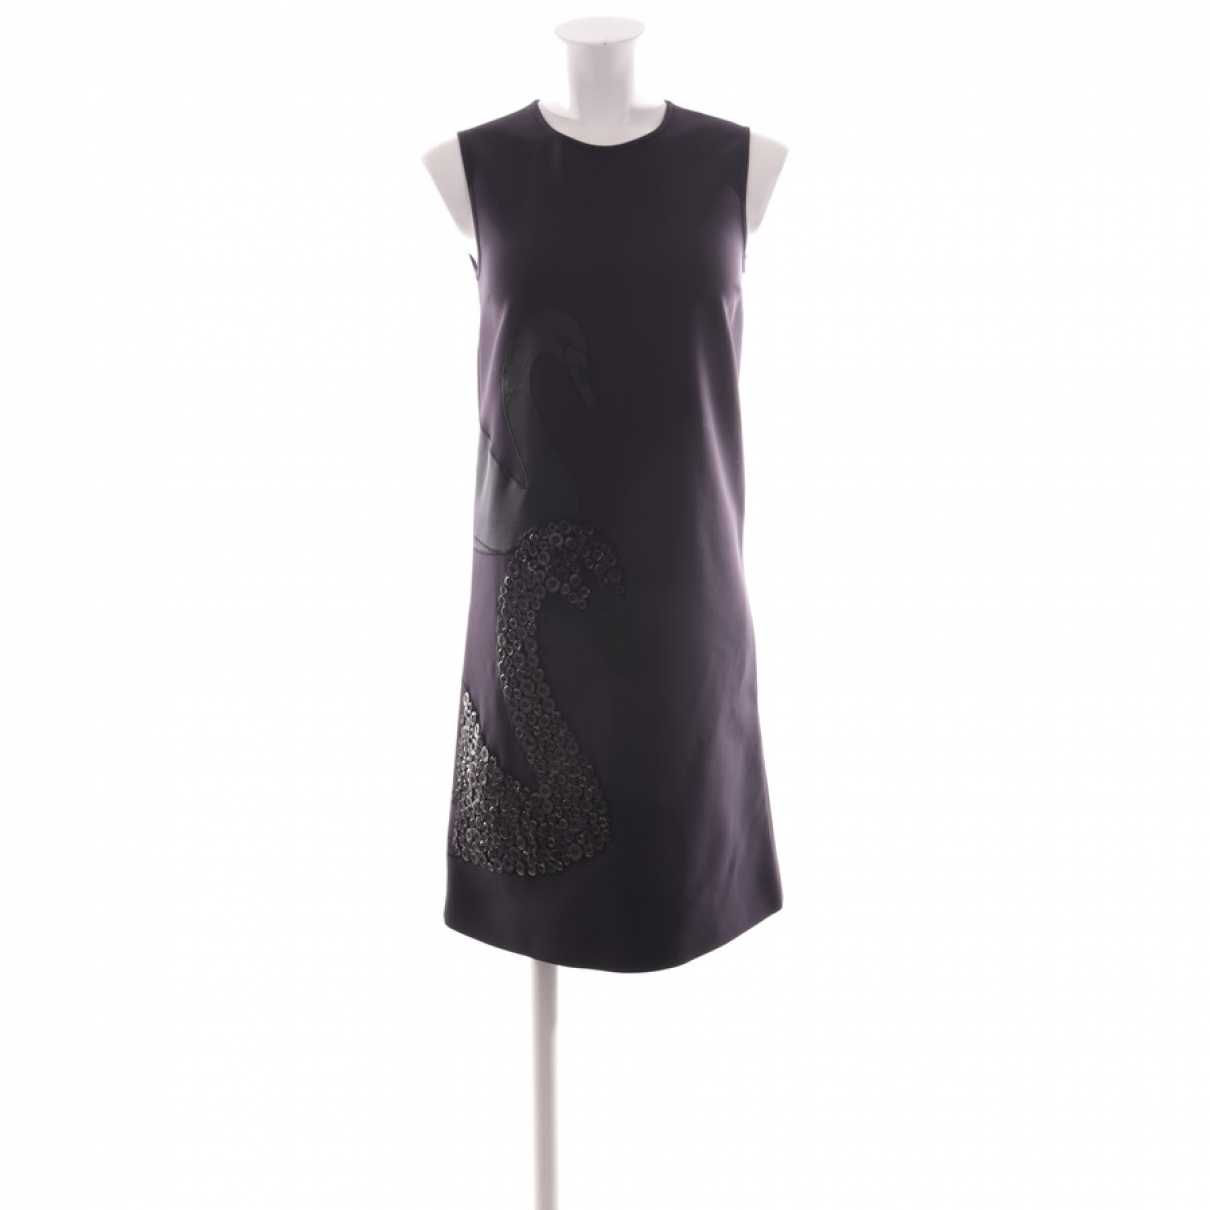 Victoria Beckham \N Purple dress for Women 32 FR